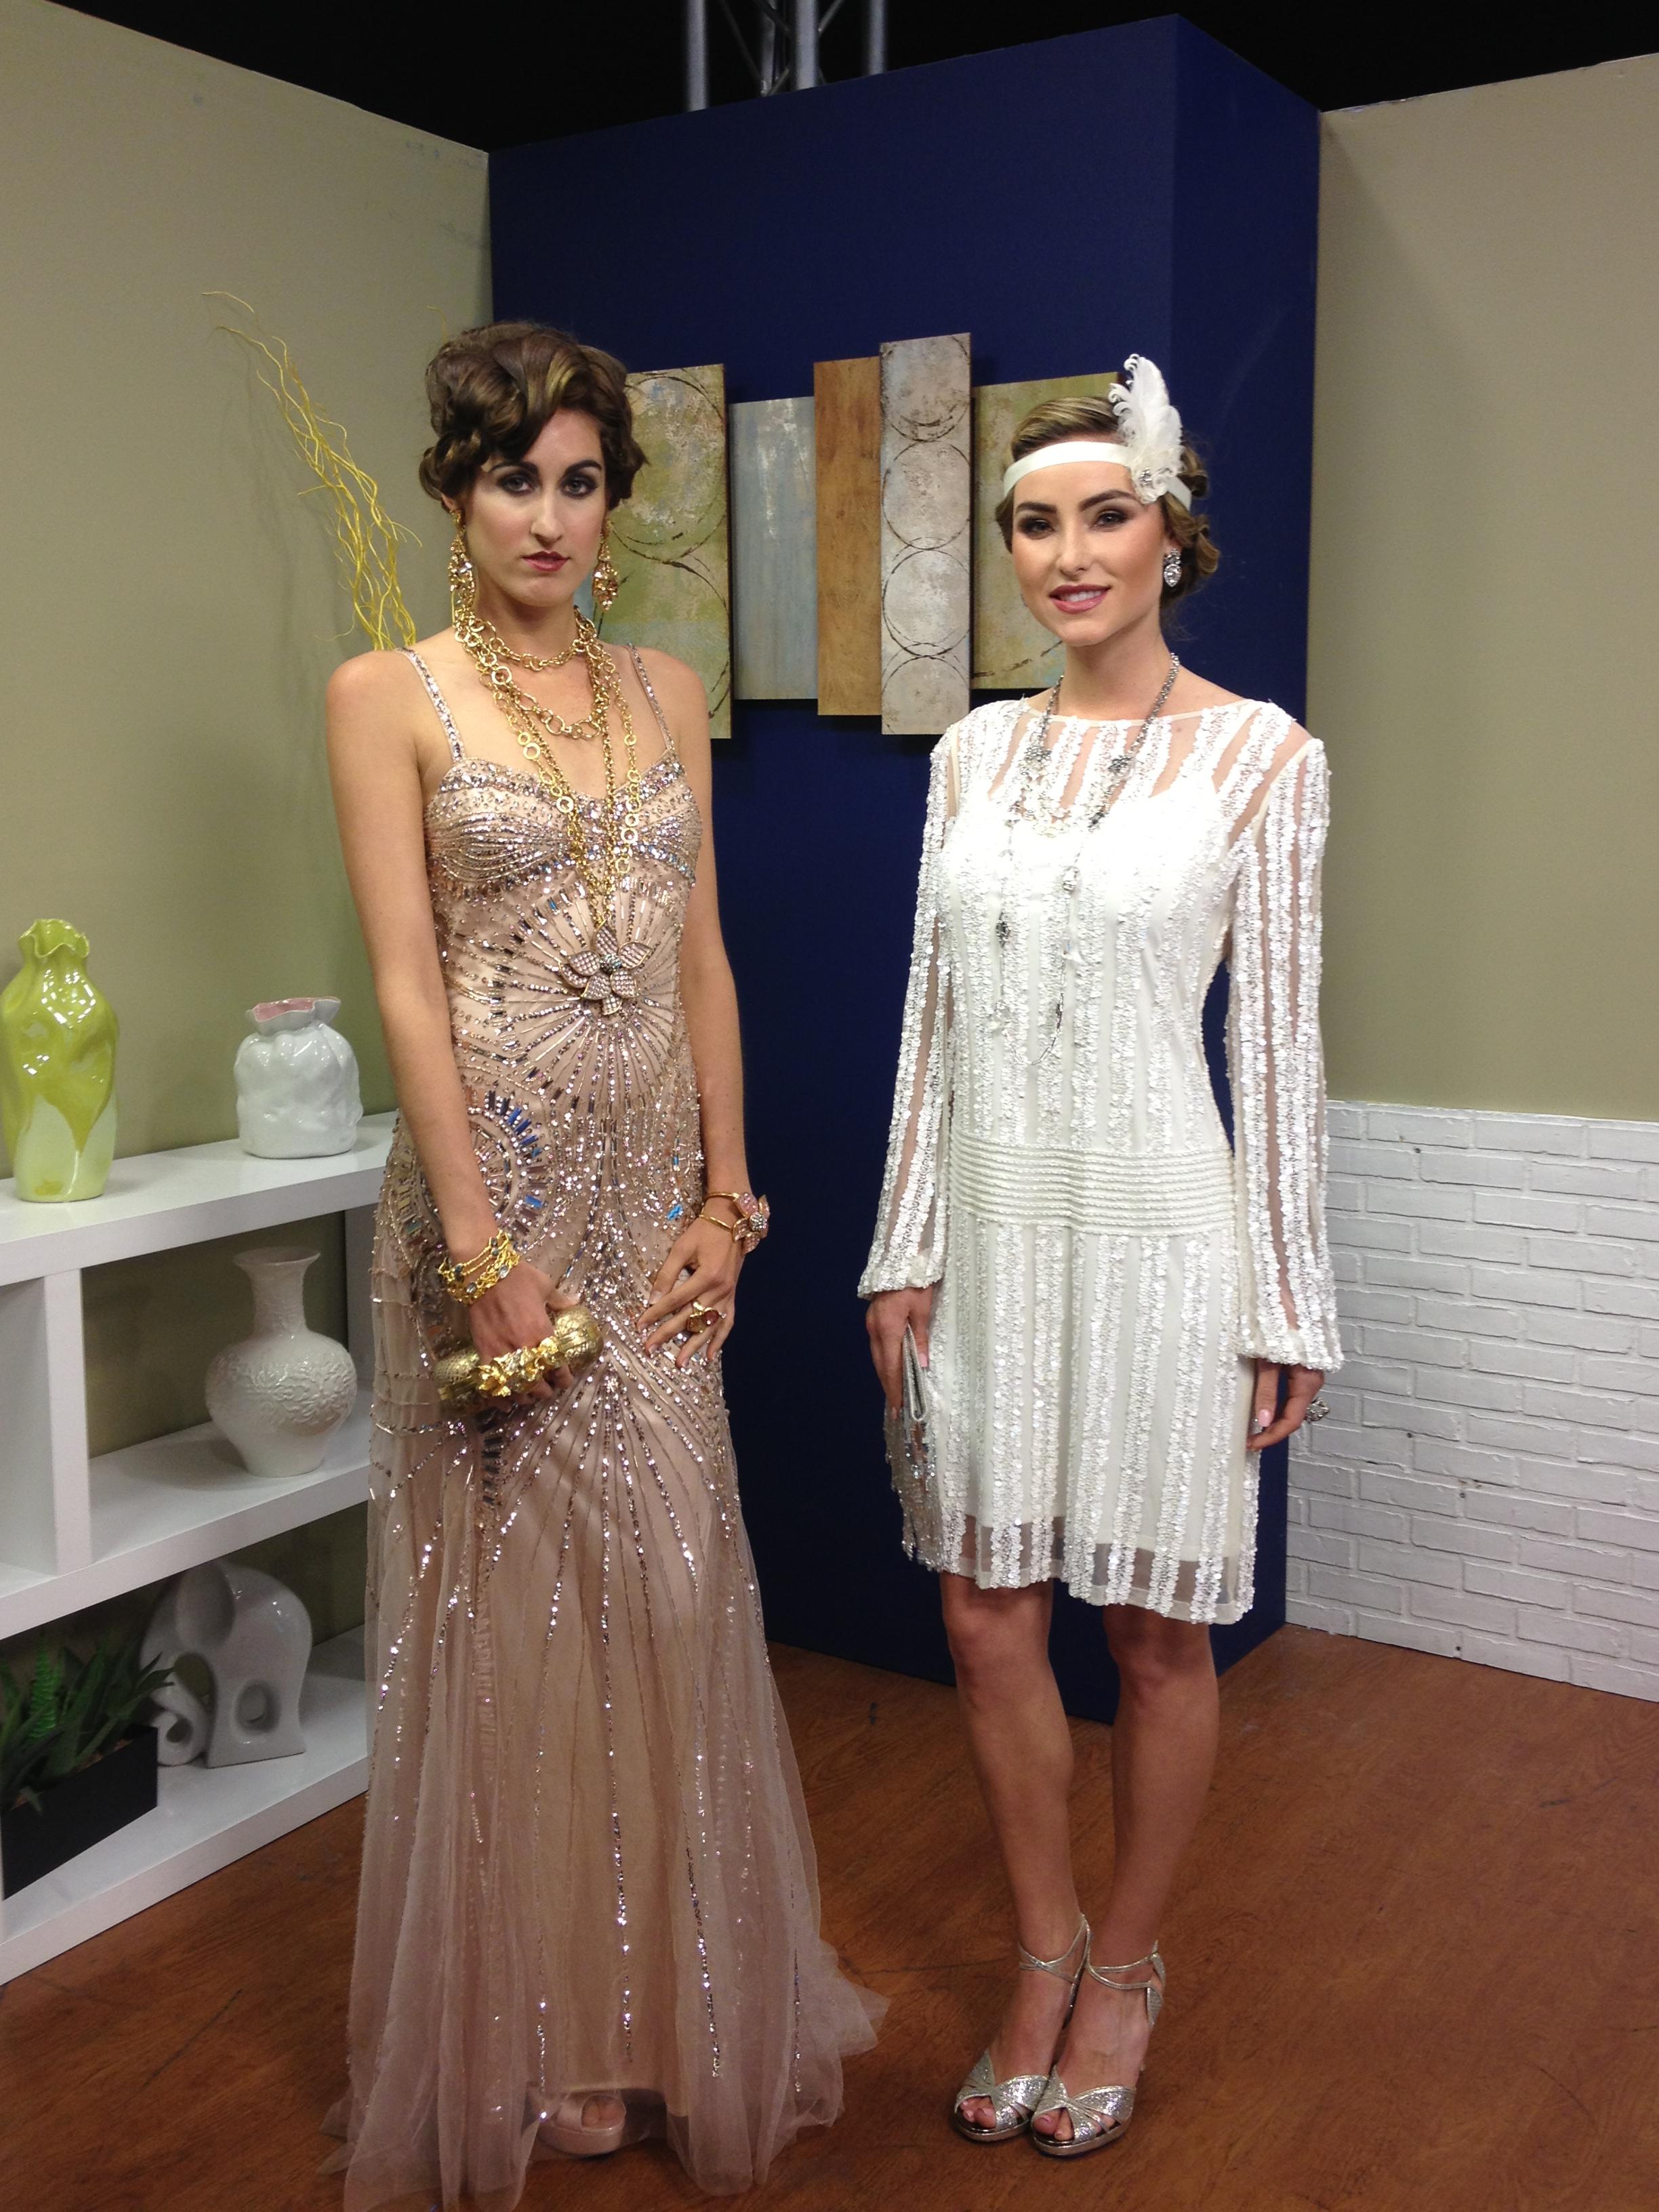 Fashion Melanie Pace